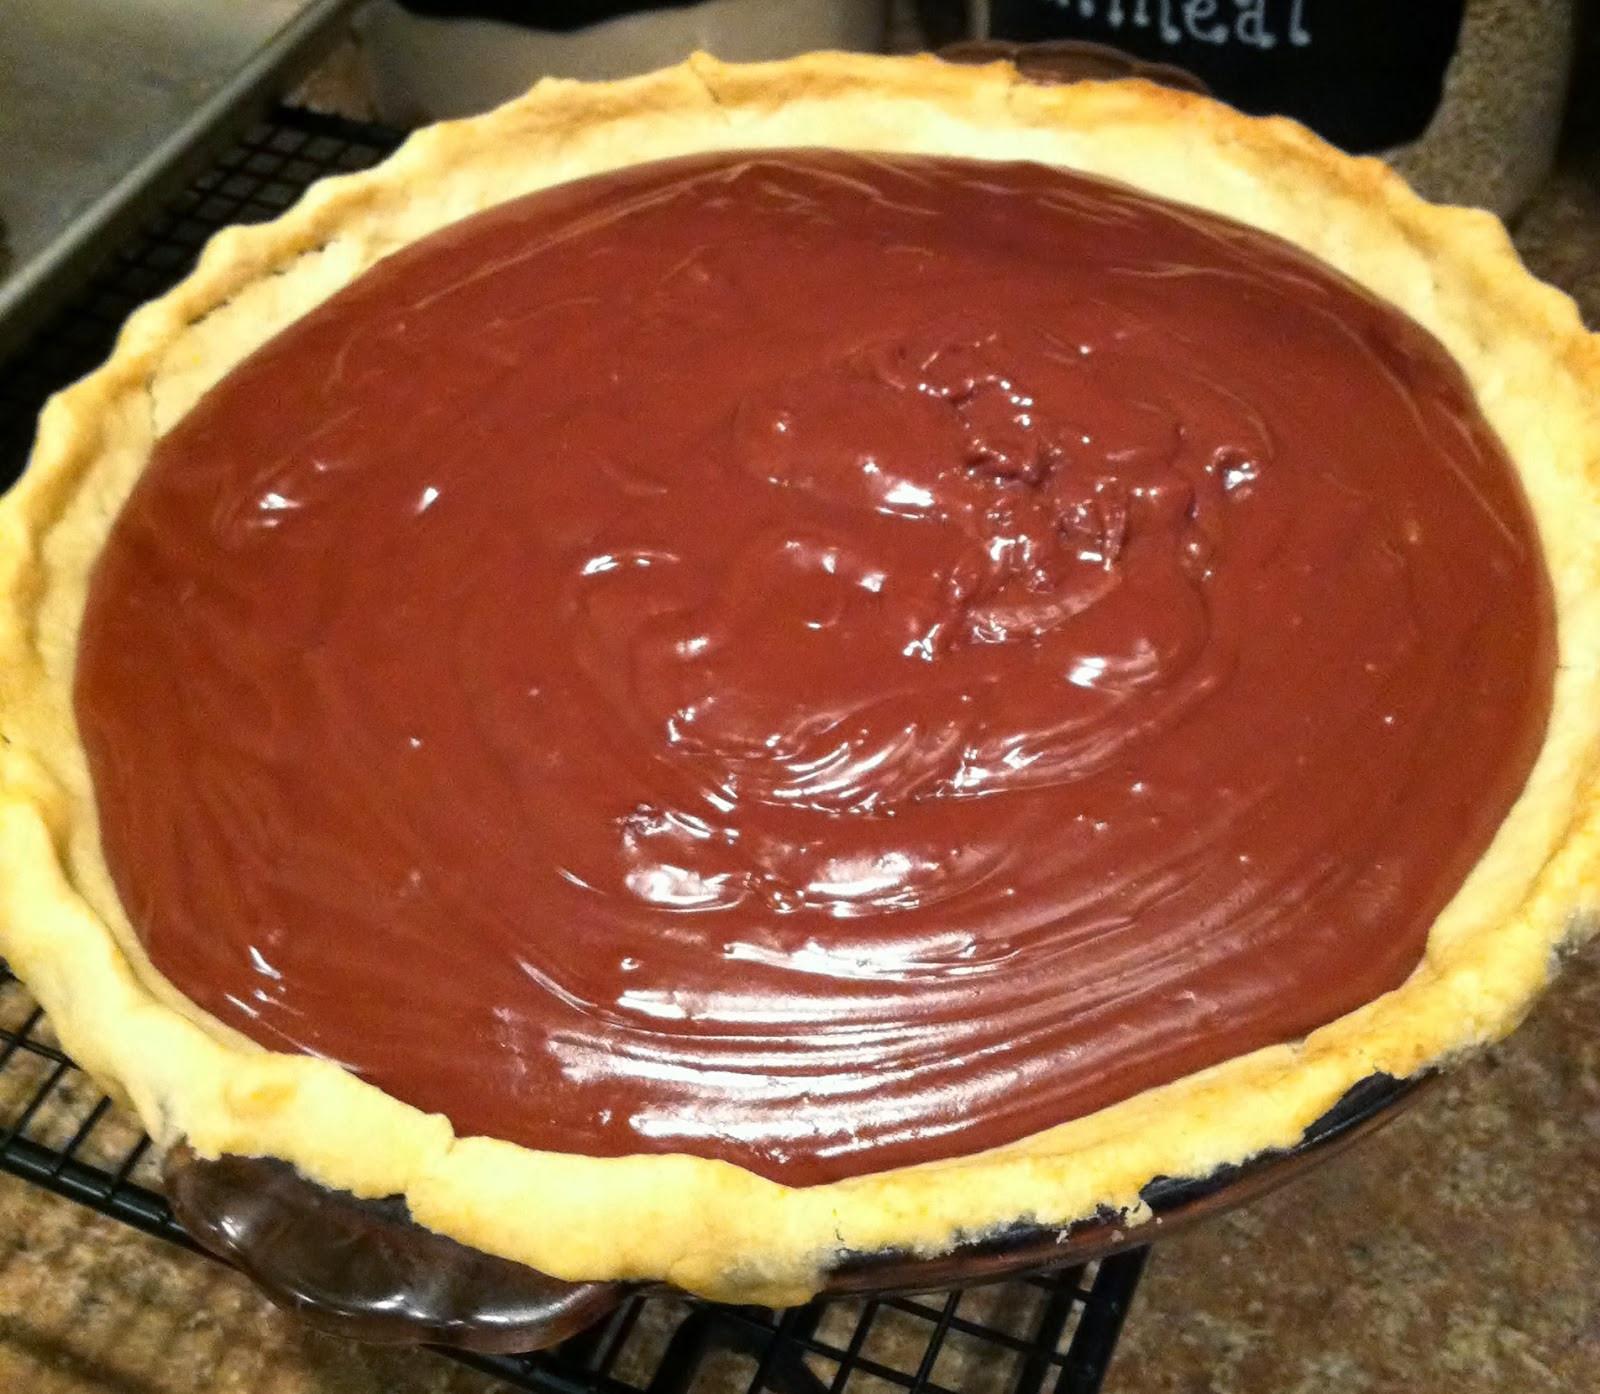 Homemade Chocolate Pie  Natural Homemade Living Homemade Chocolate Pie